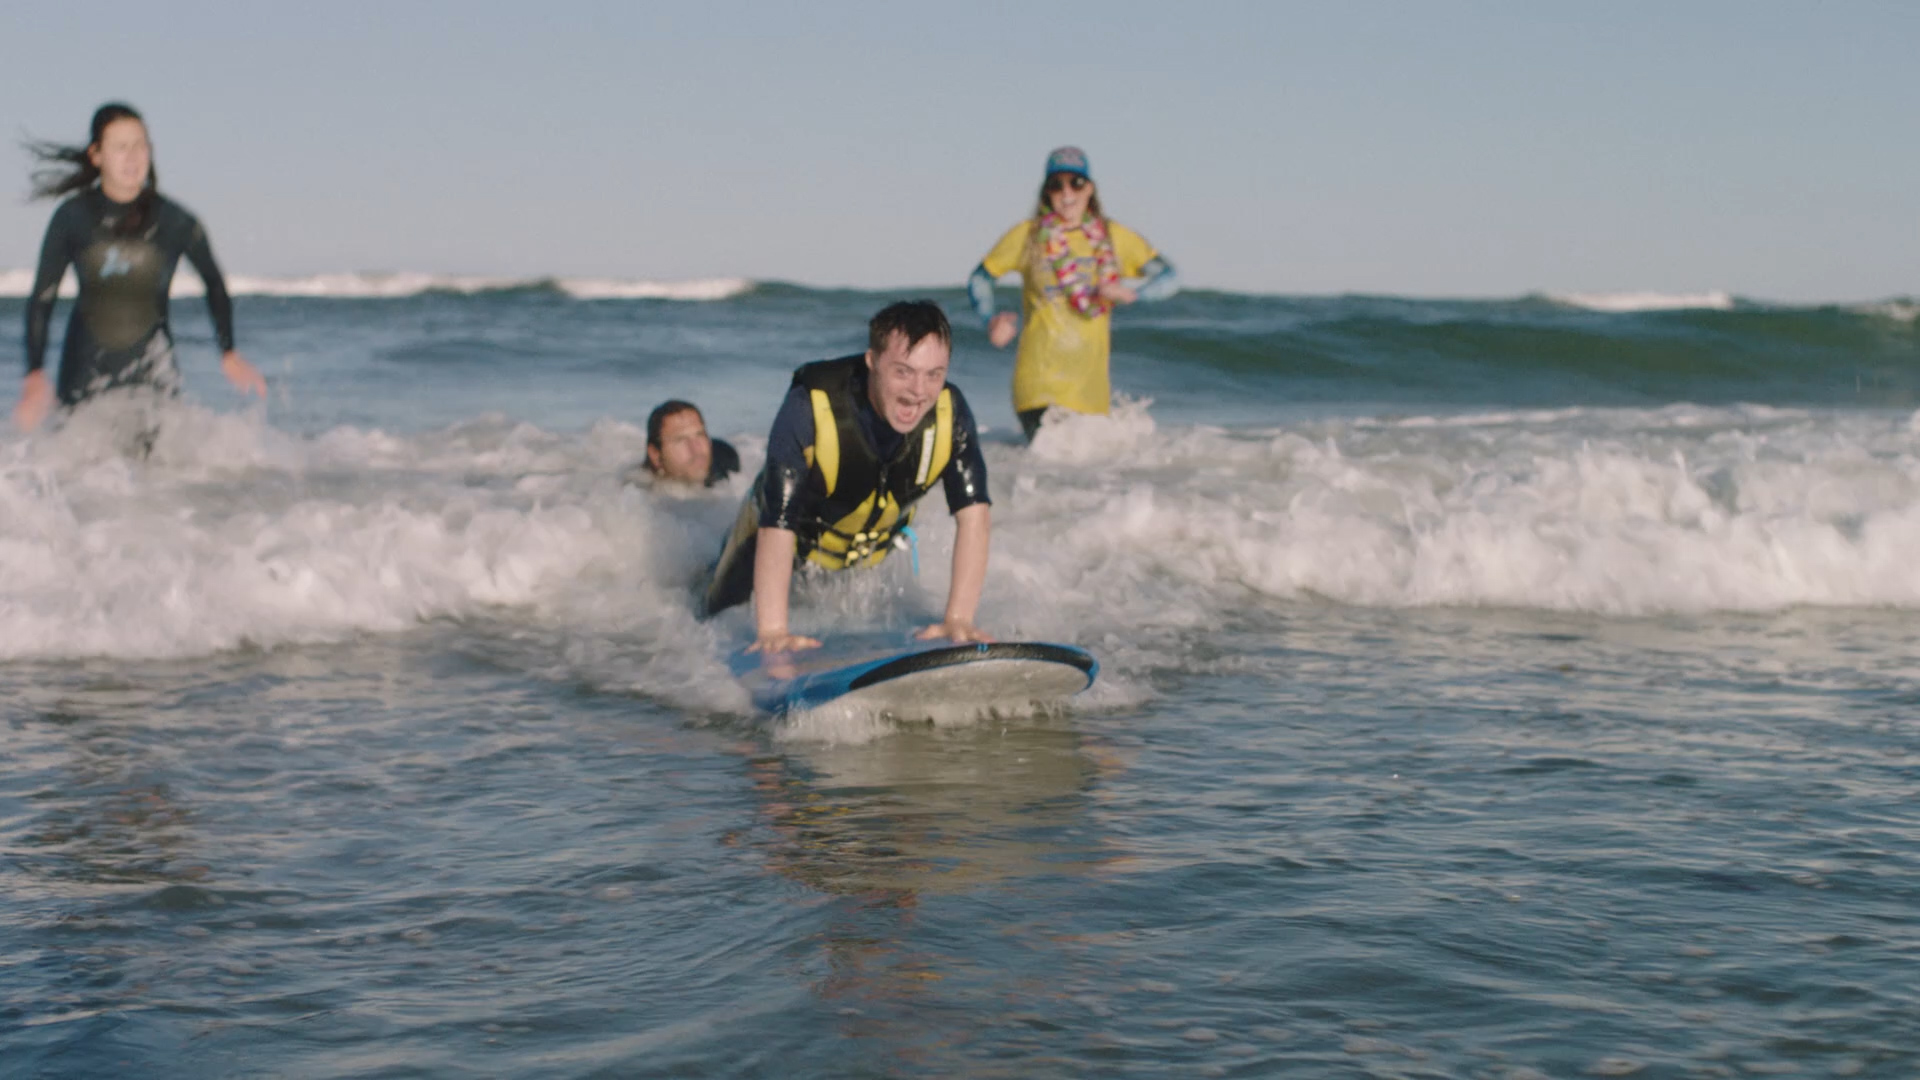 Dean Goes Surfing - Still 05 / dir. Caitlyn Greene / DP Mack Fisher